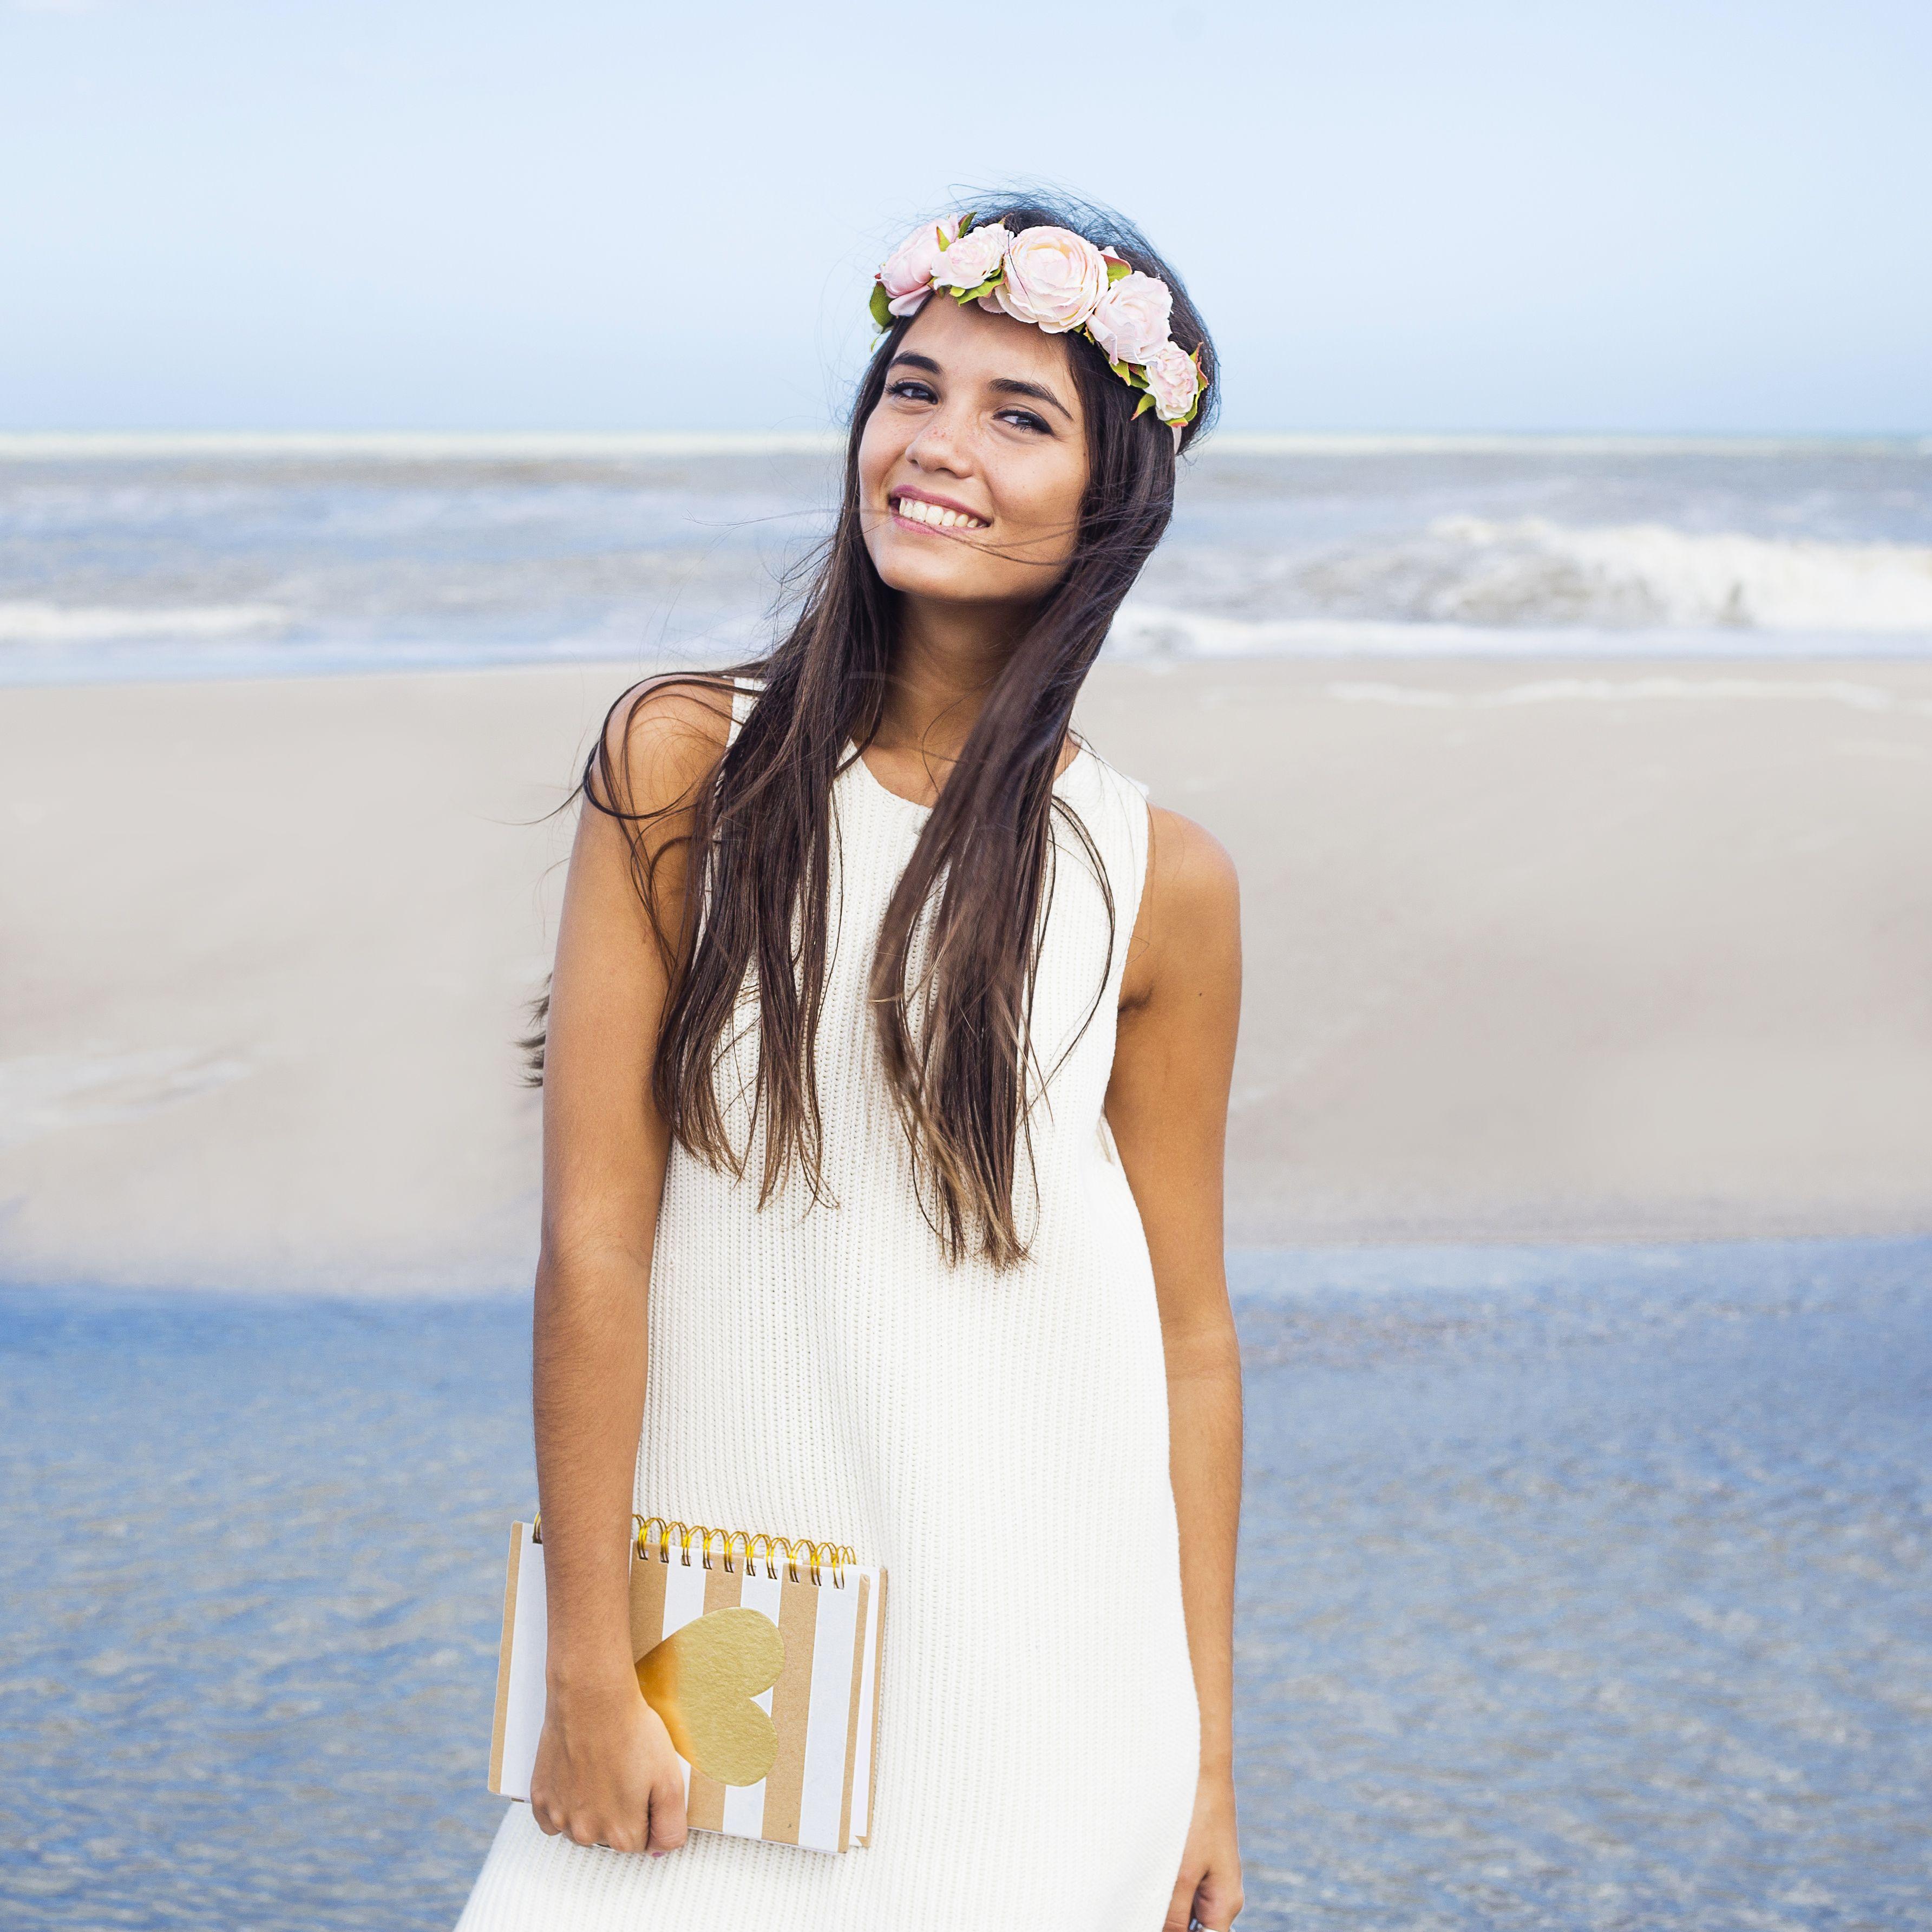 [ LOOK DEL DIA ] Modelo: @julietasoe  Ph. @lucarnevaleph  Styling: @petramartirena  Location: Costa Esmeralda  #SoydeGrecia #Fashion